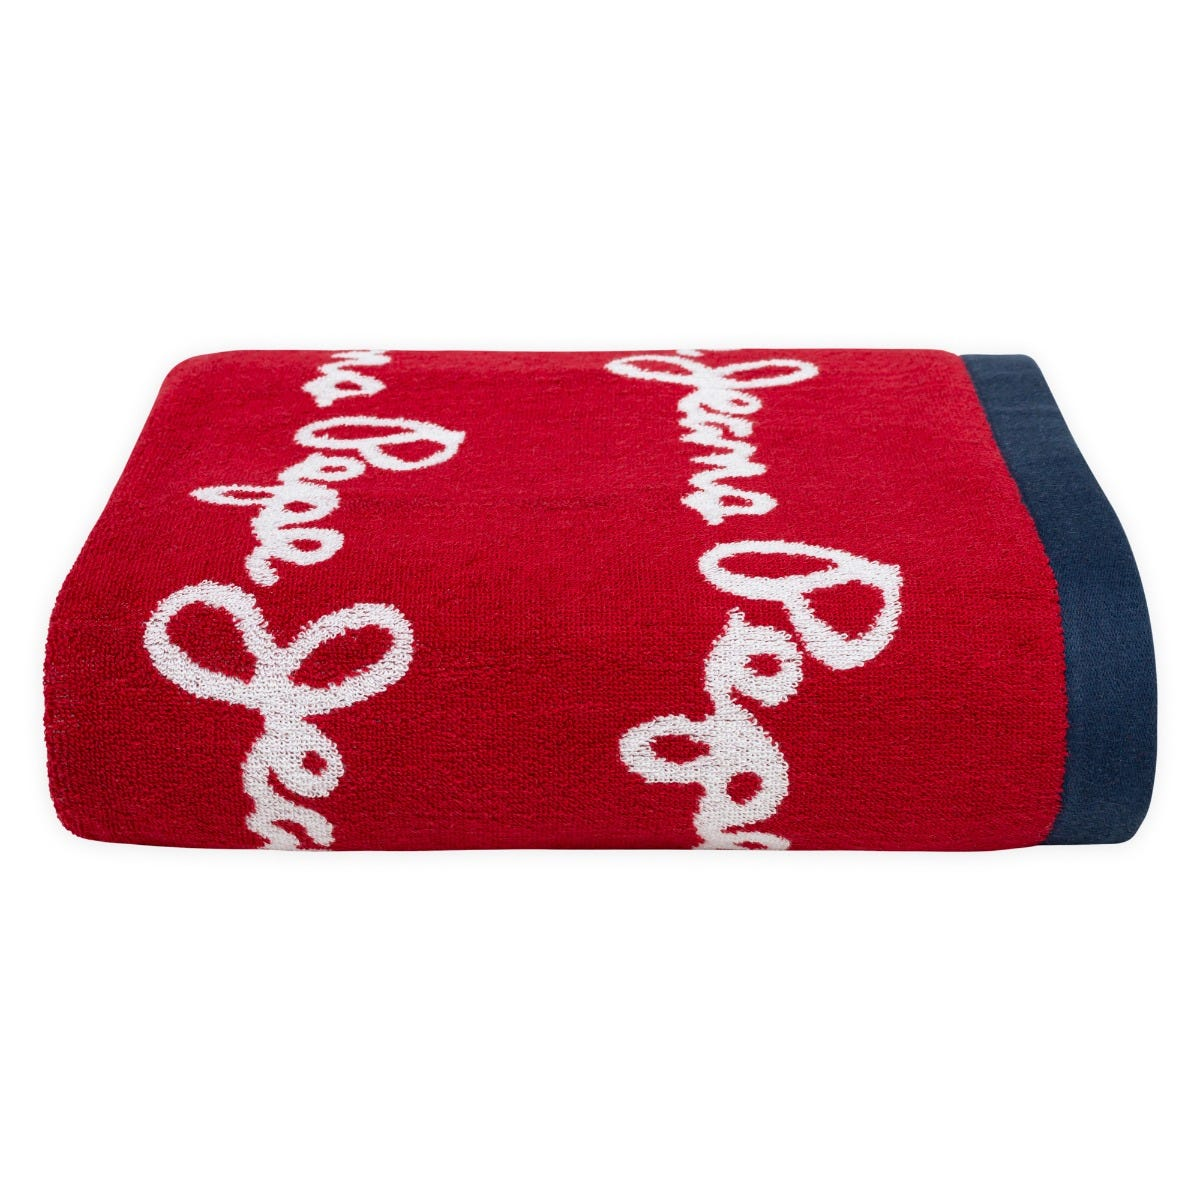 Toalla medio baño Pepe Jeans® Porter en rojo